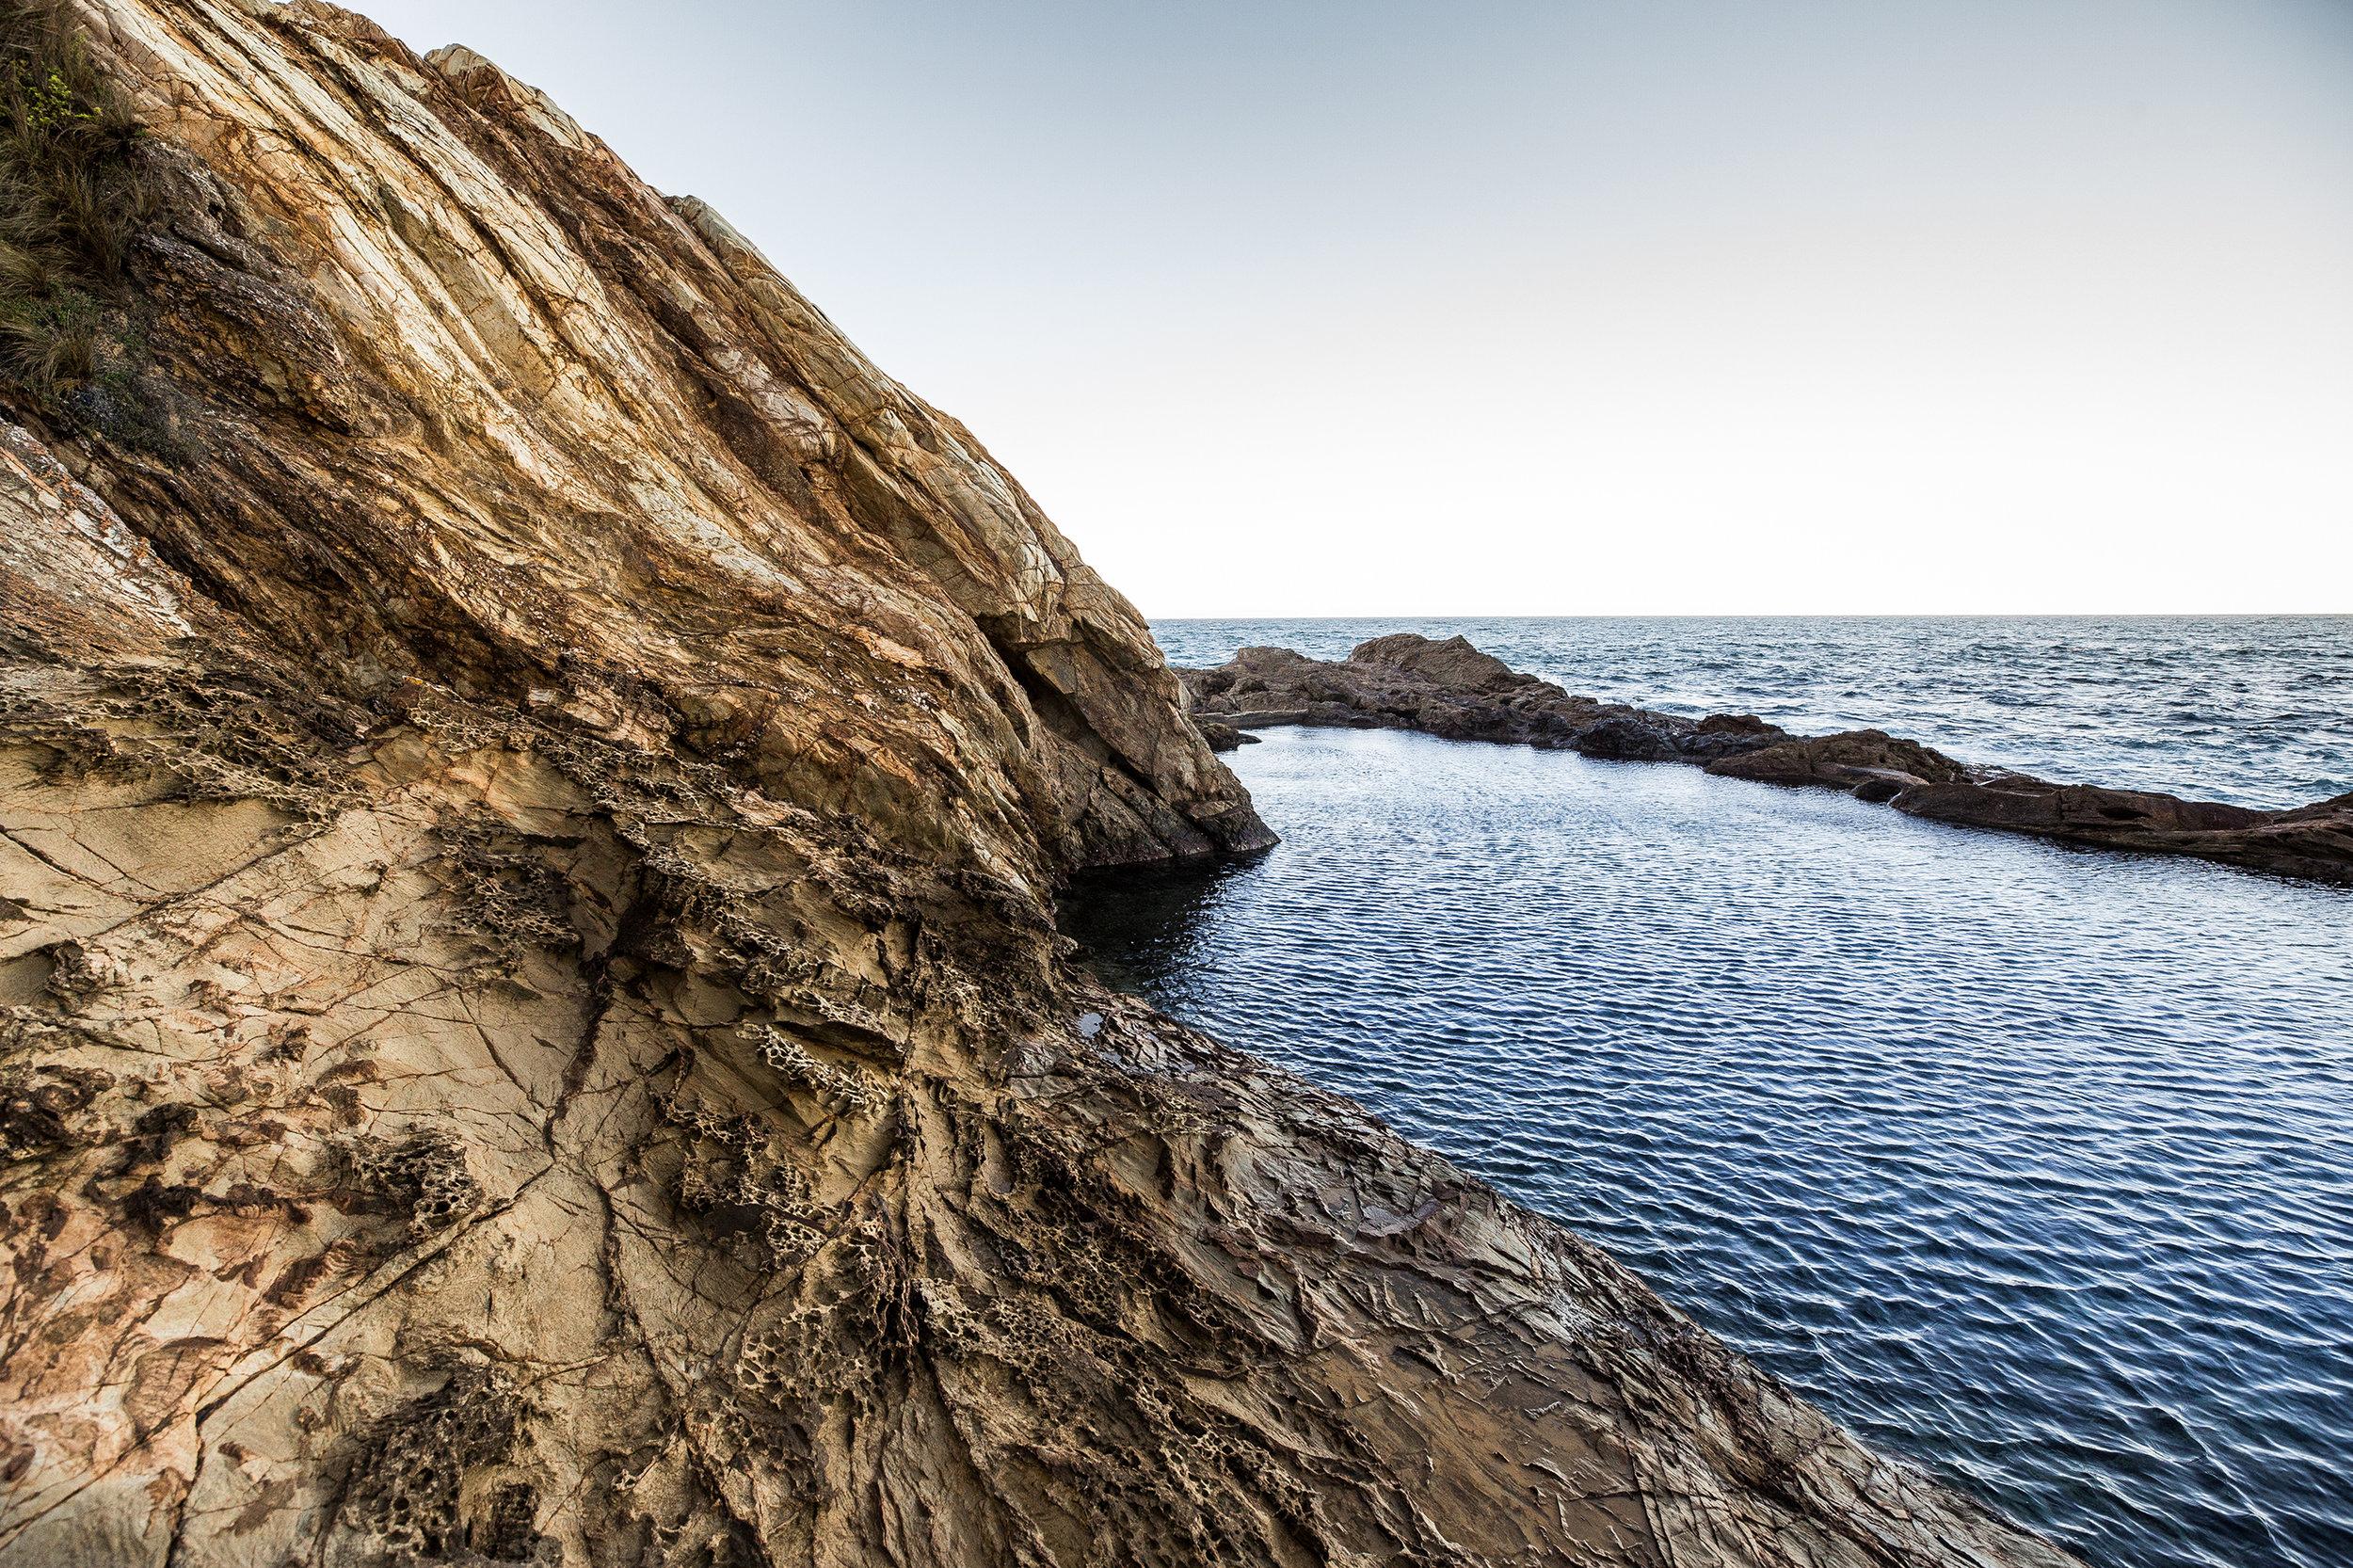 Sapphire Coast_2019:06:26_Bermagui_ Blue Pools_CREDITDestinationNSW_Trent van der Jagt_69.jpg